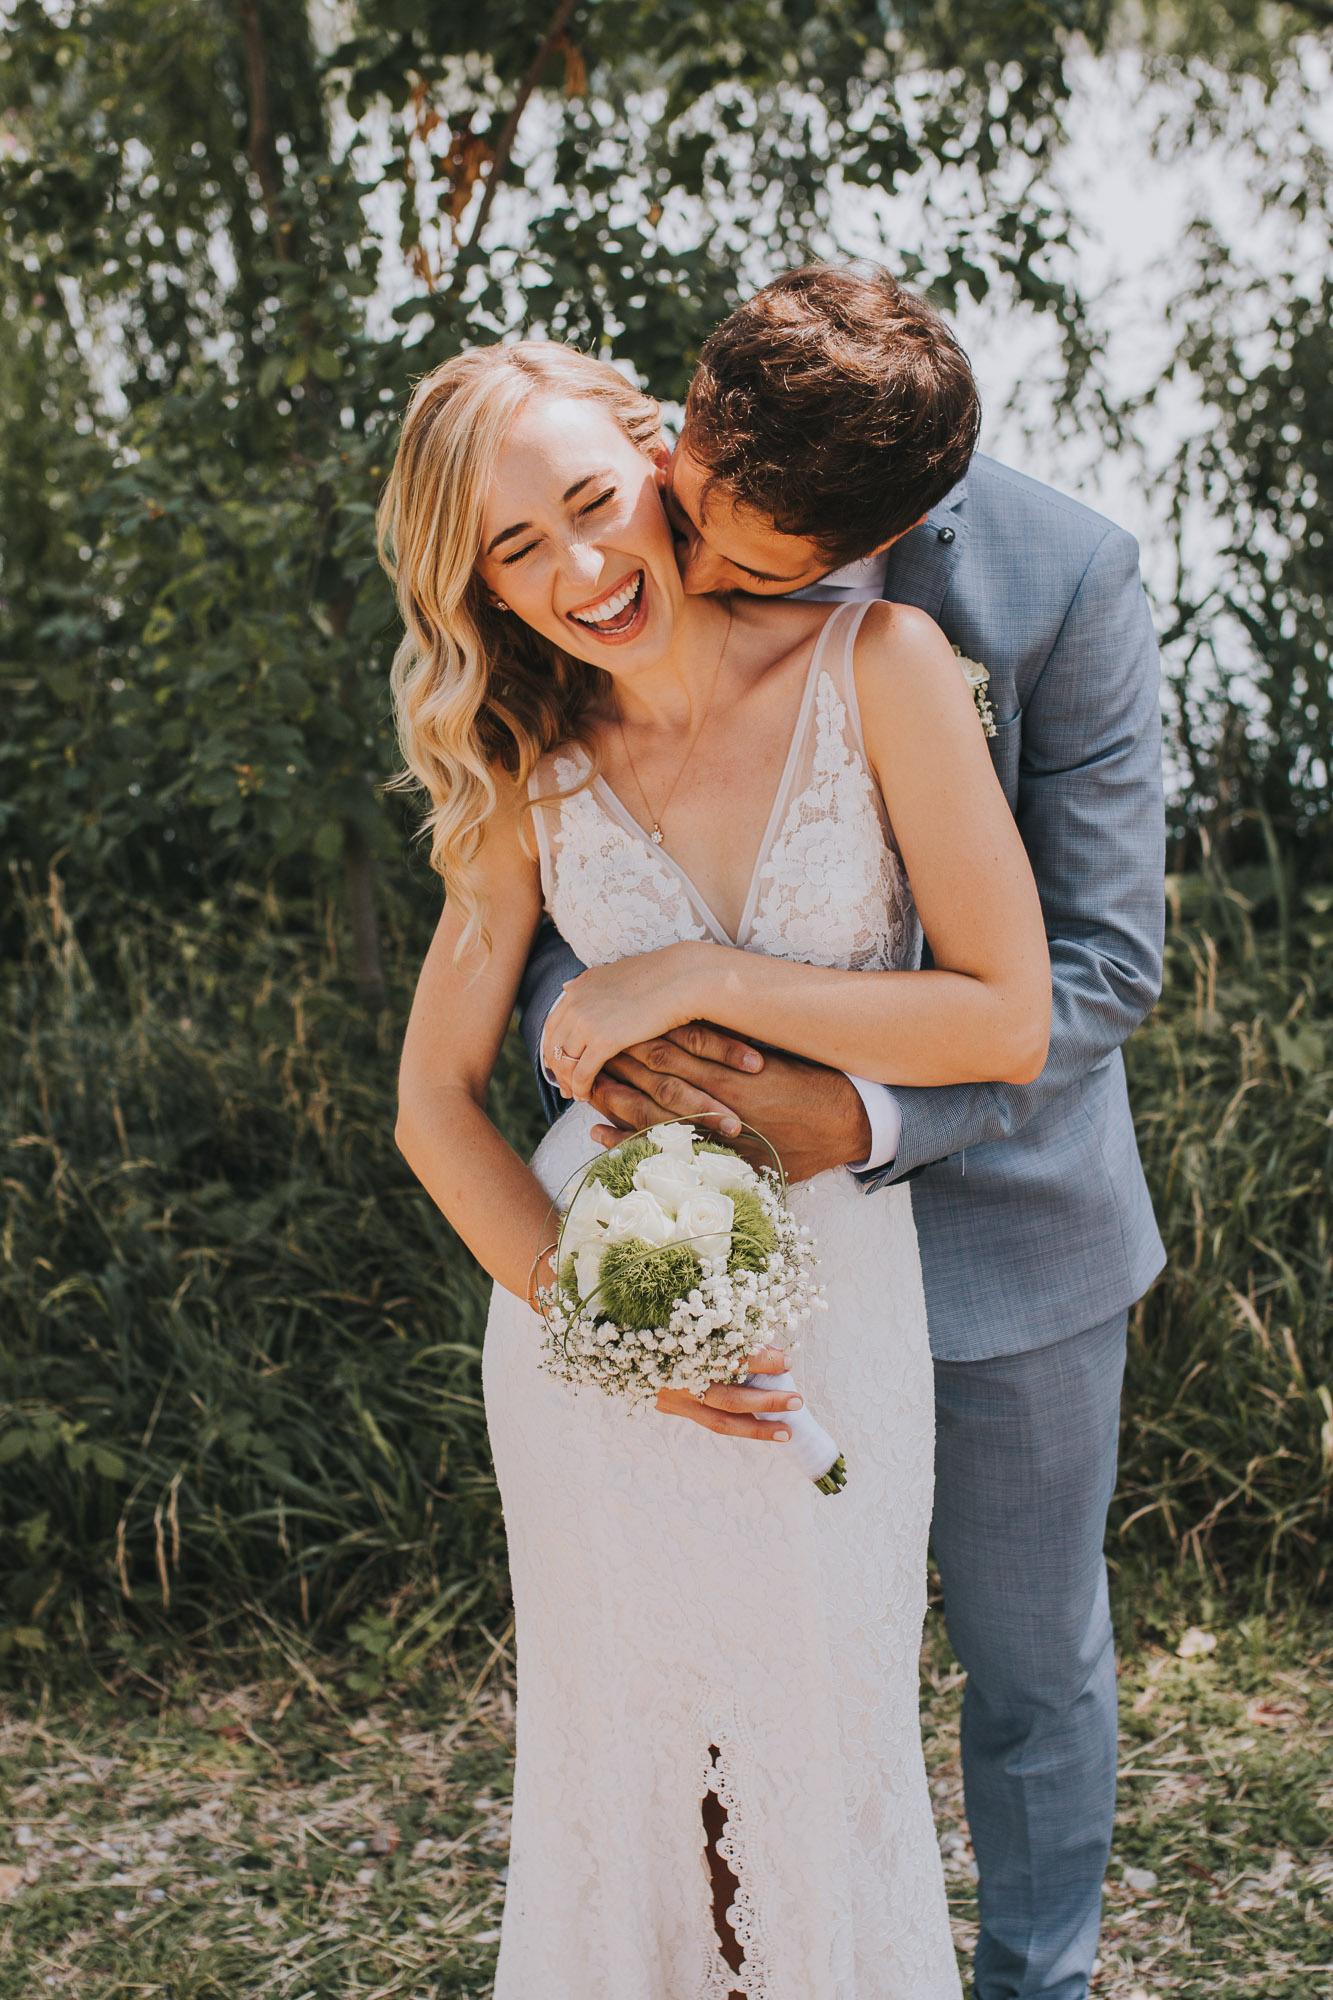 20180720-Memoryfactory-Sara&Jacopo-33- Hochzeit.jpg